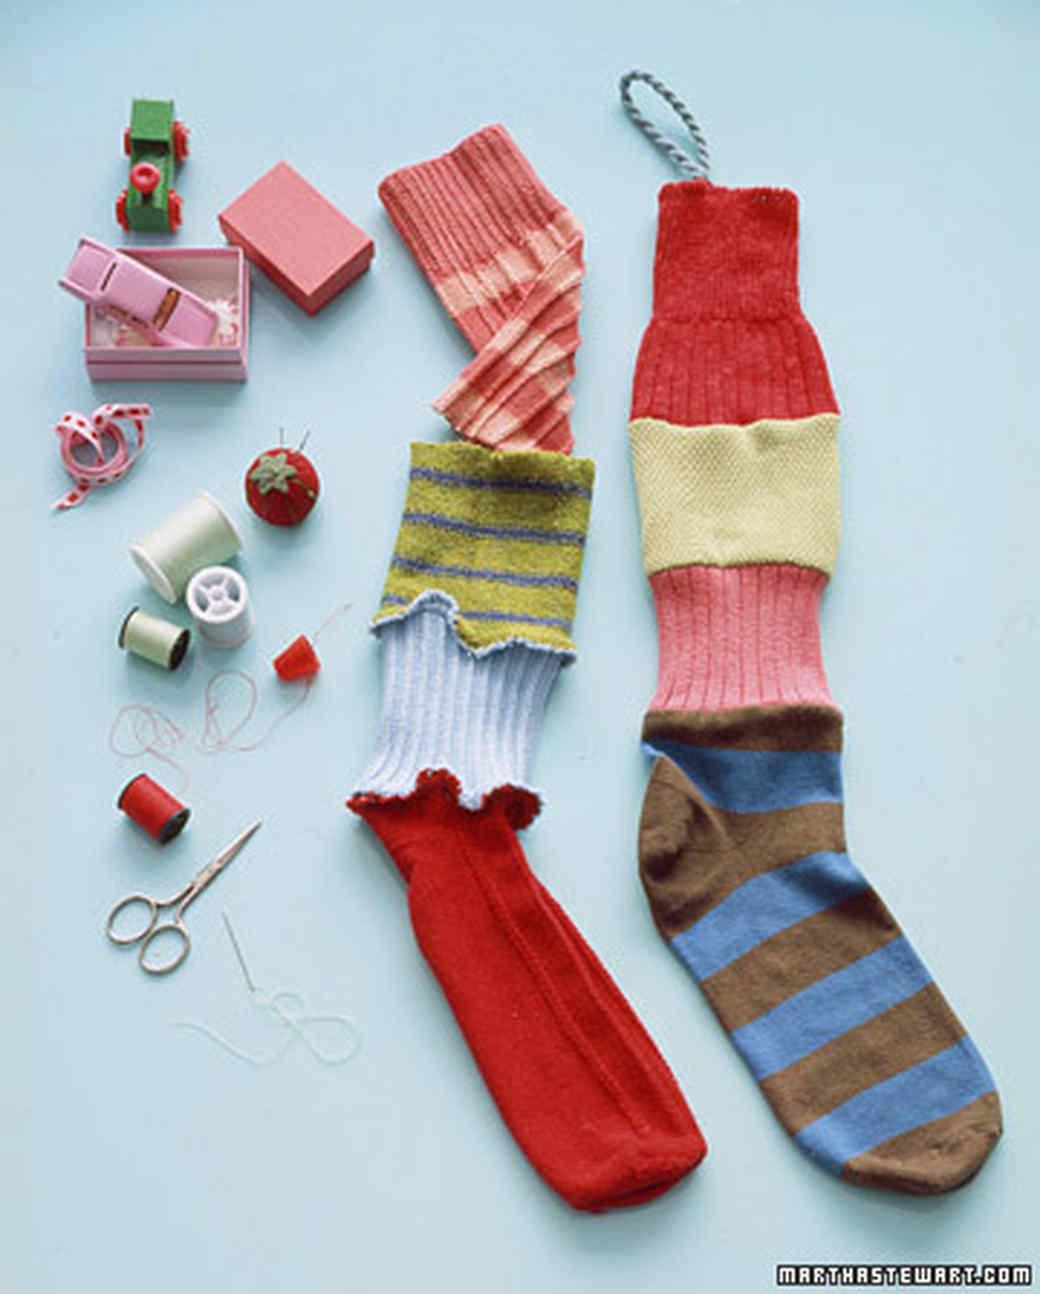 Add-a-Sock Stocking